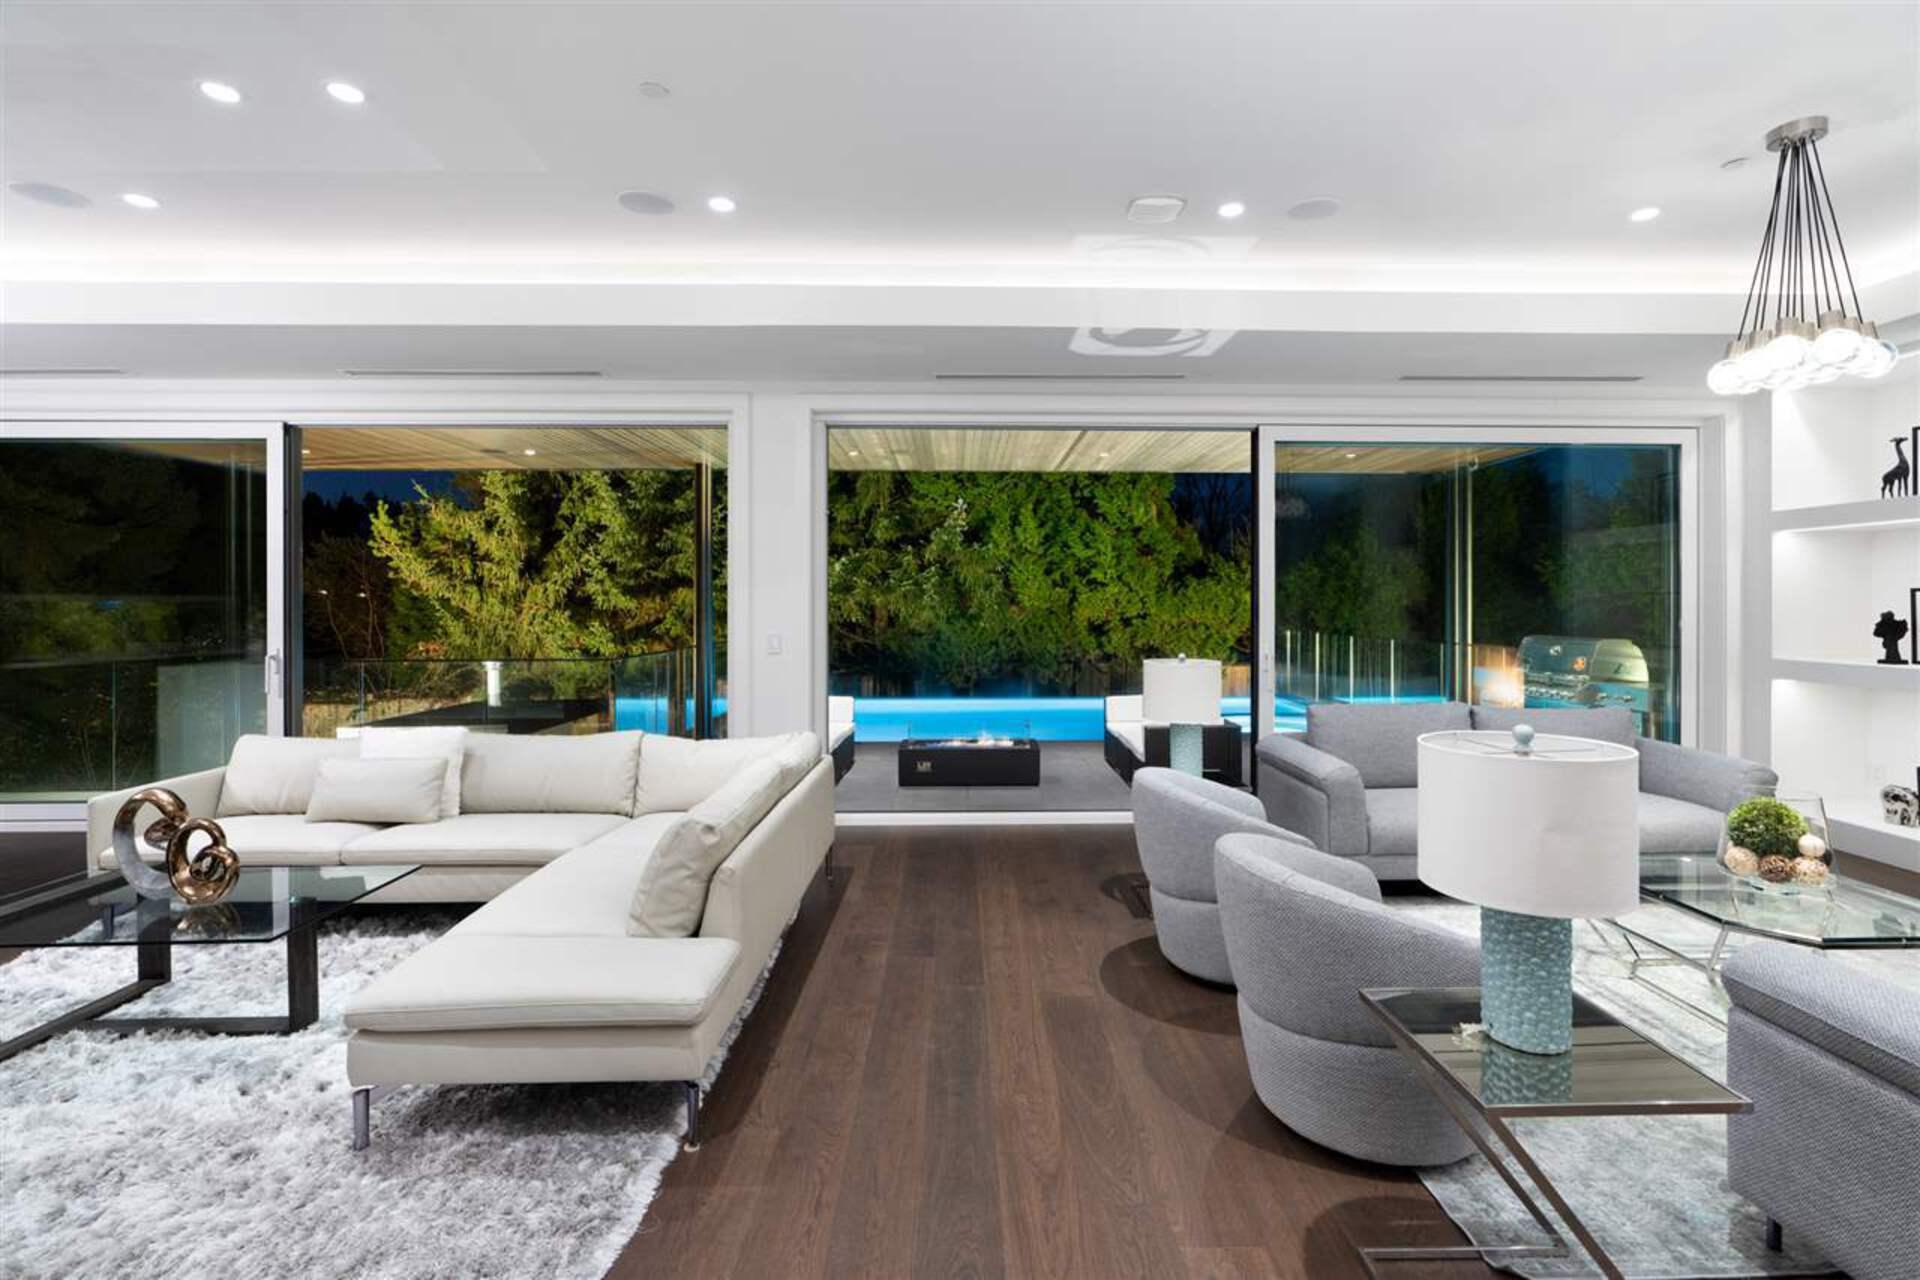 1040-wildwood-lane-british-properties-west-vancouver-09 at 1040 Wildwood Lane, British Properties, West Vancouver